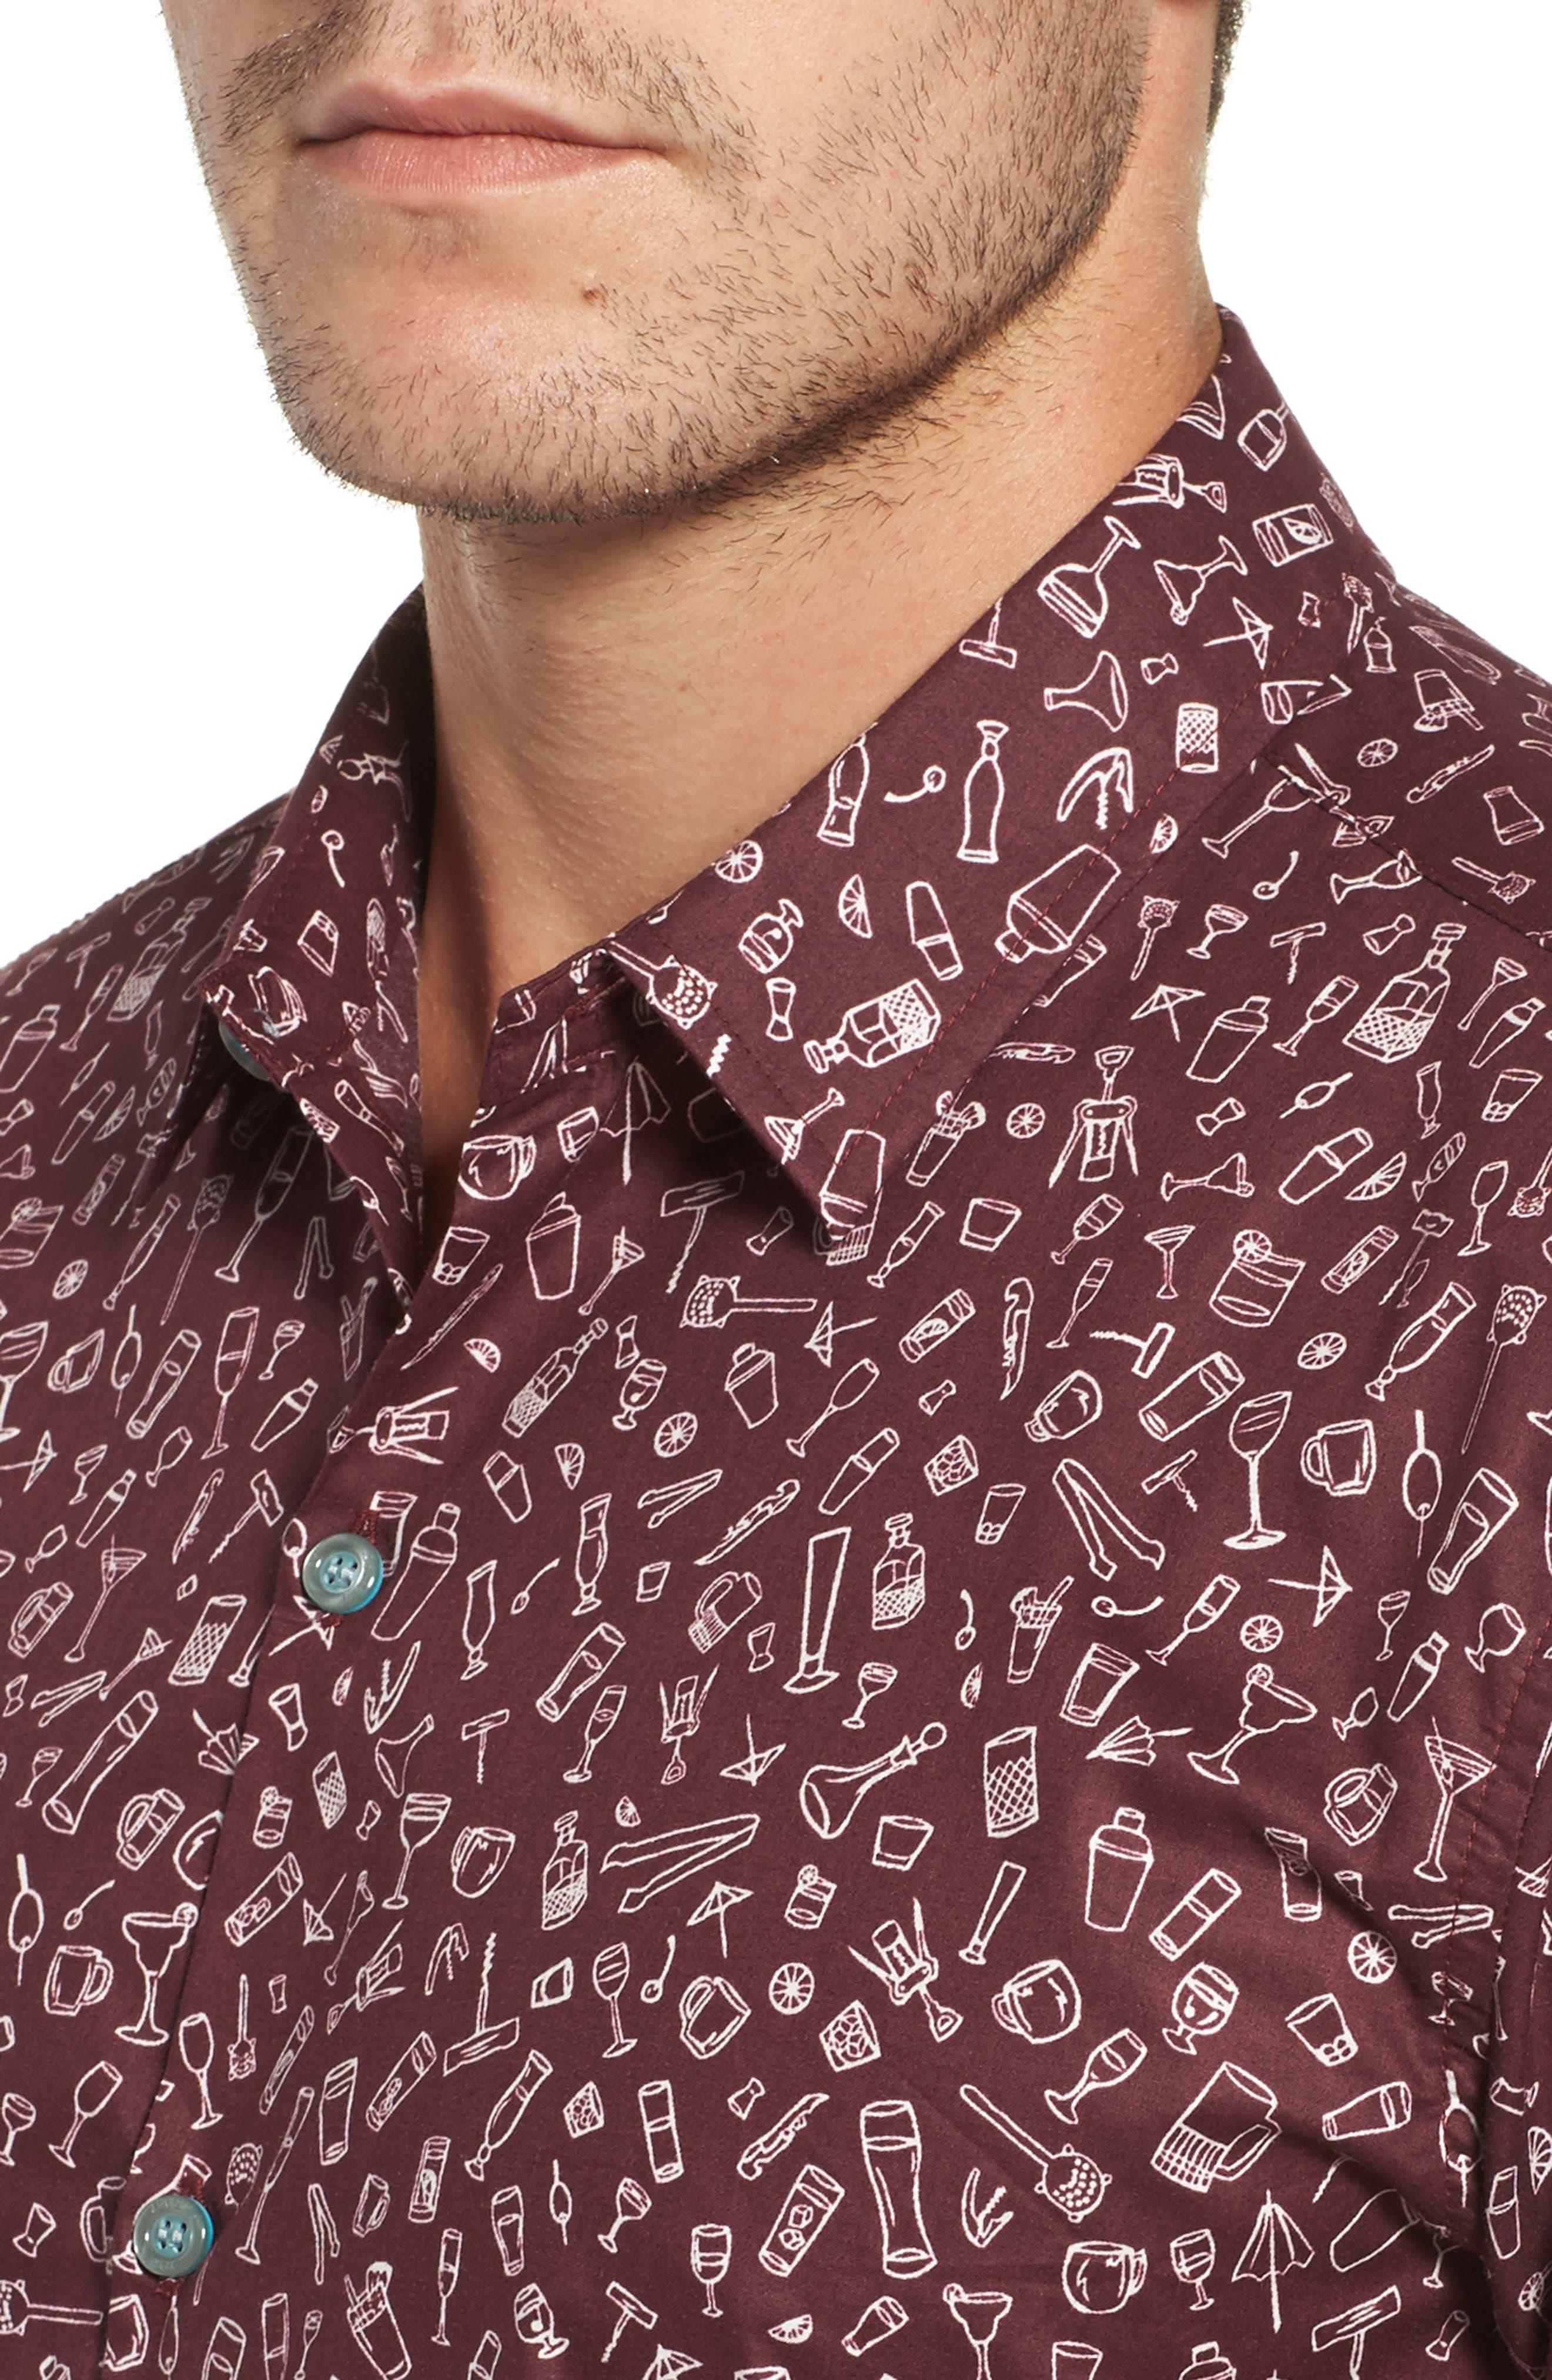 5 PM Slim Fit Camp Shirt,                             Alternate thumbnail 4, color,                             Wine